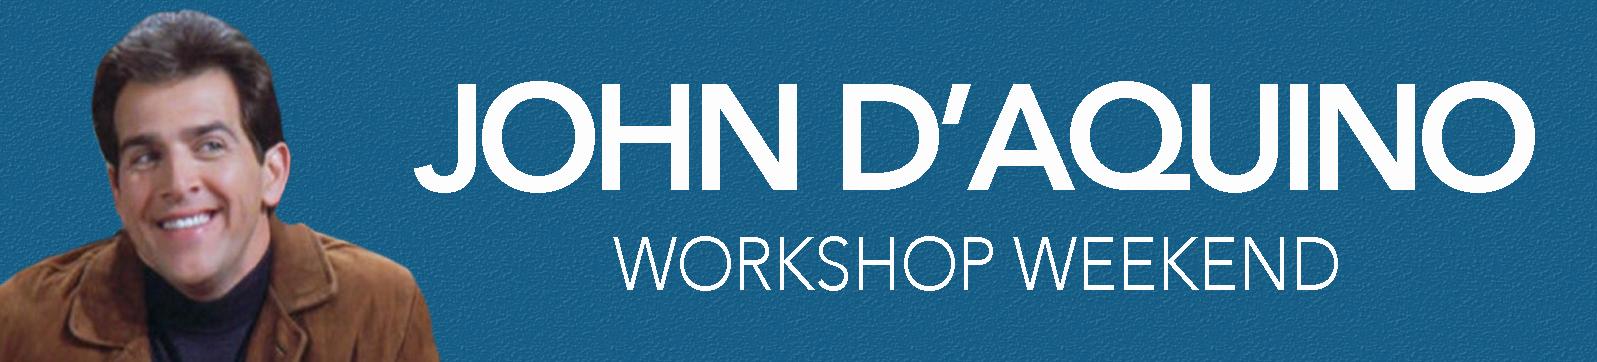 John D'Aquino - Workshop Weekend